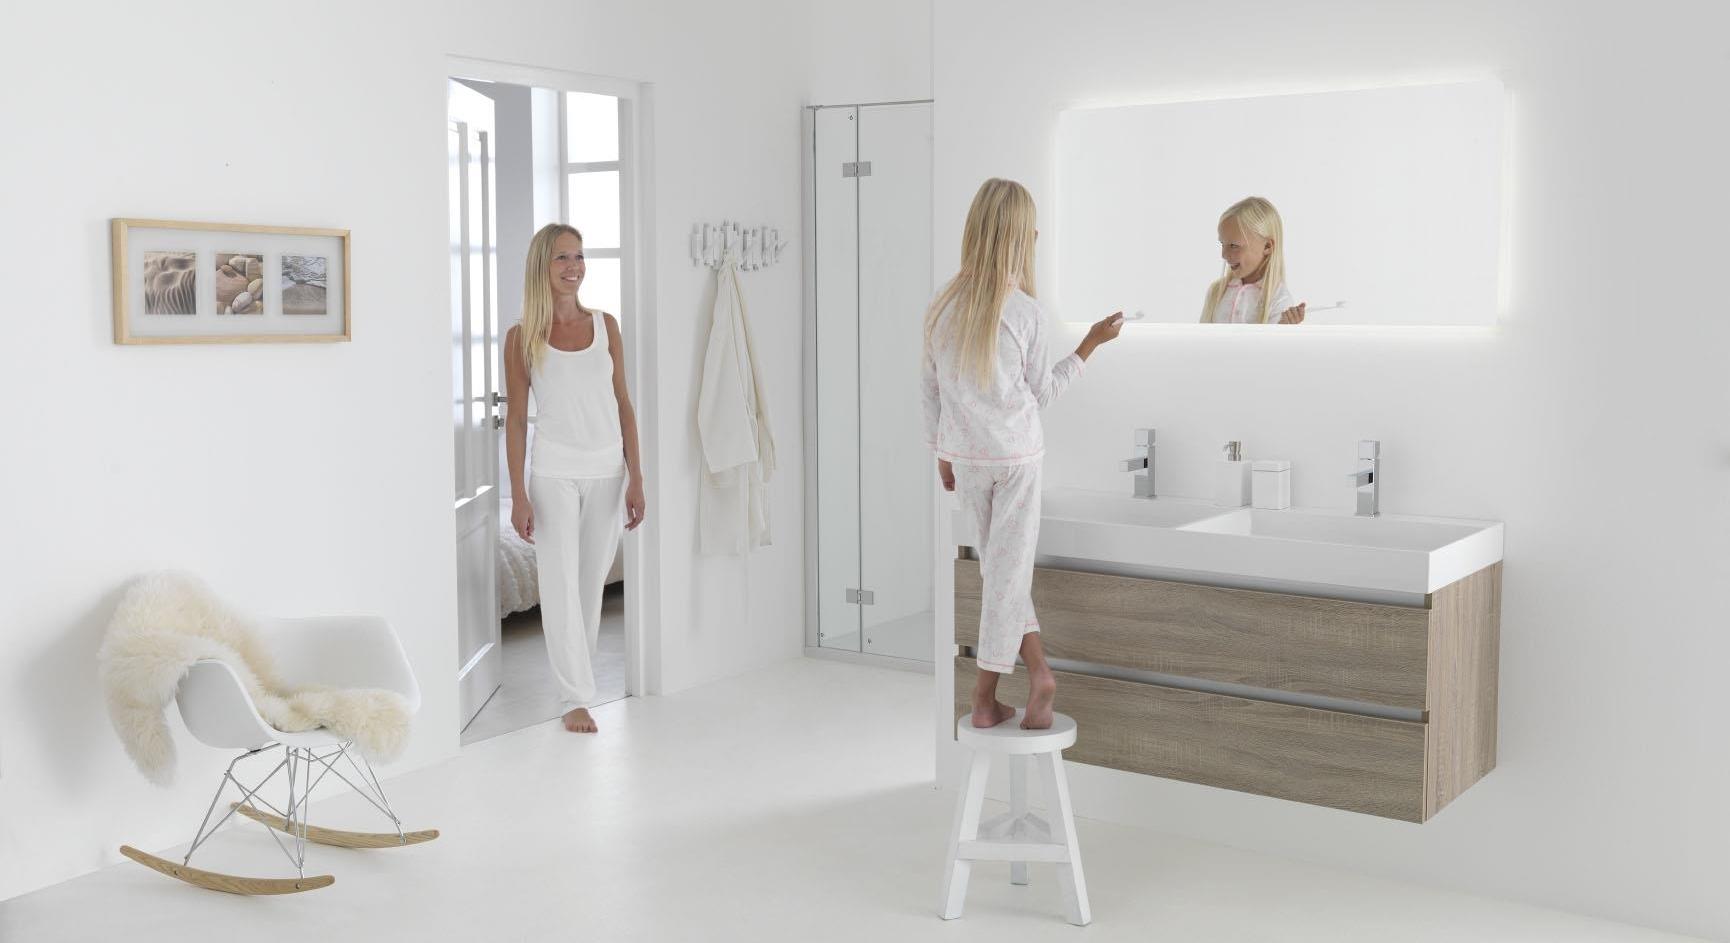 Spiegelkast Met Verlichting Badkamer.Spiegelkast Verlichting Badkamer Spiegelkasten Spiegel Met